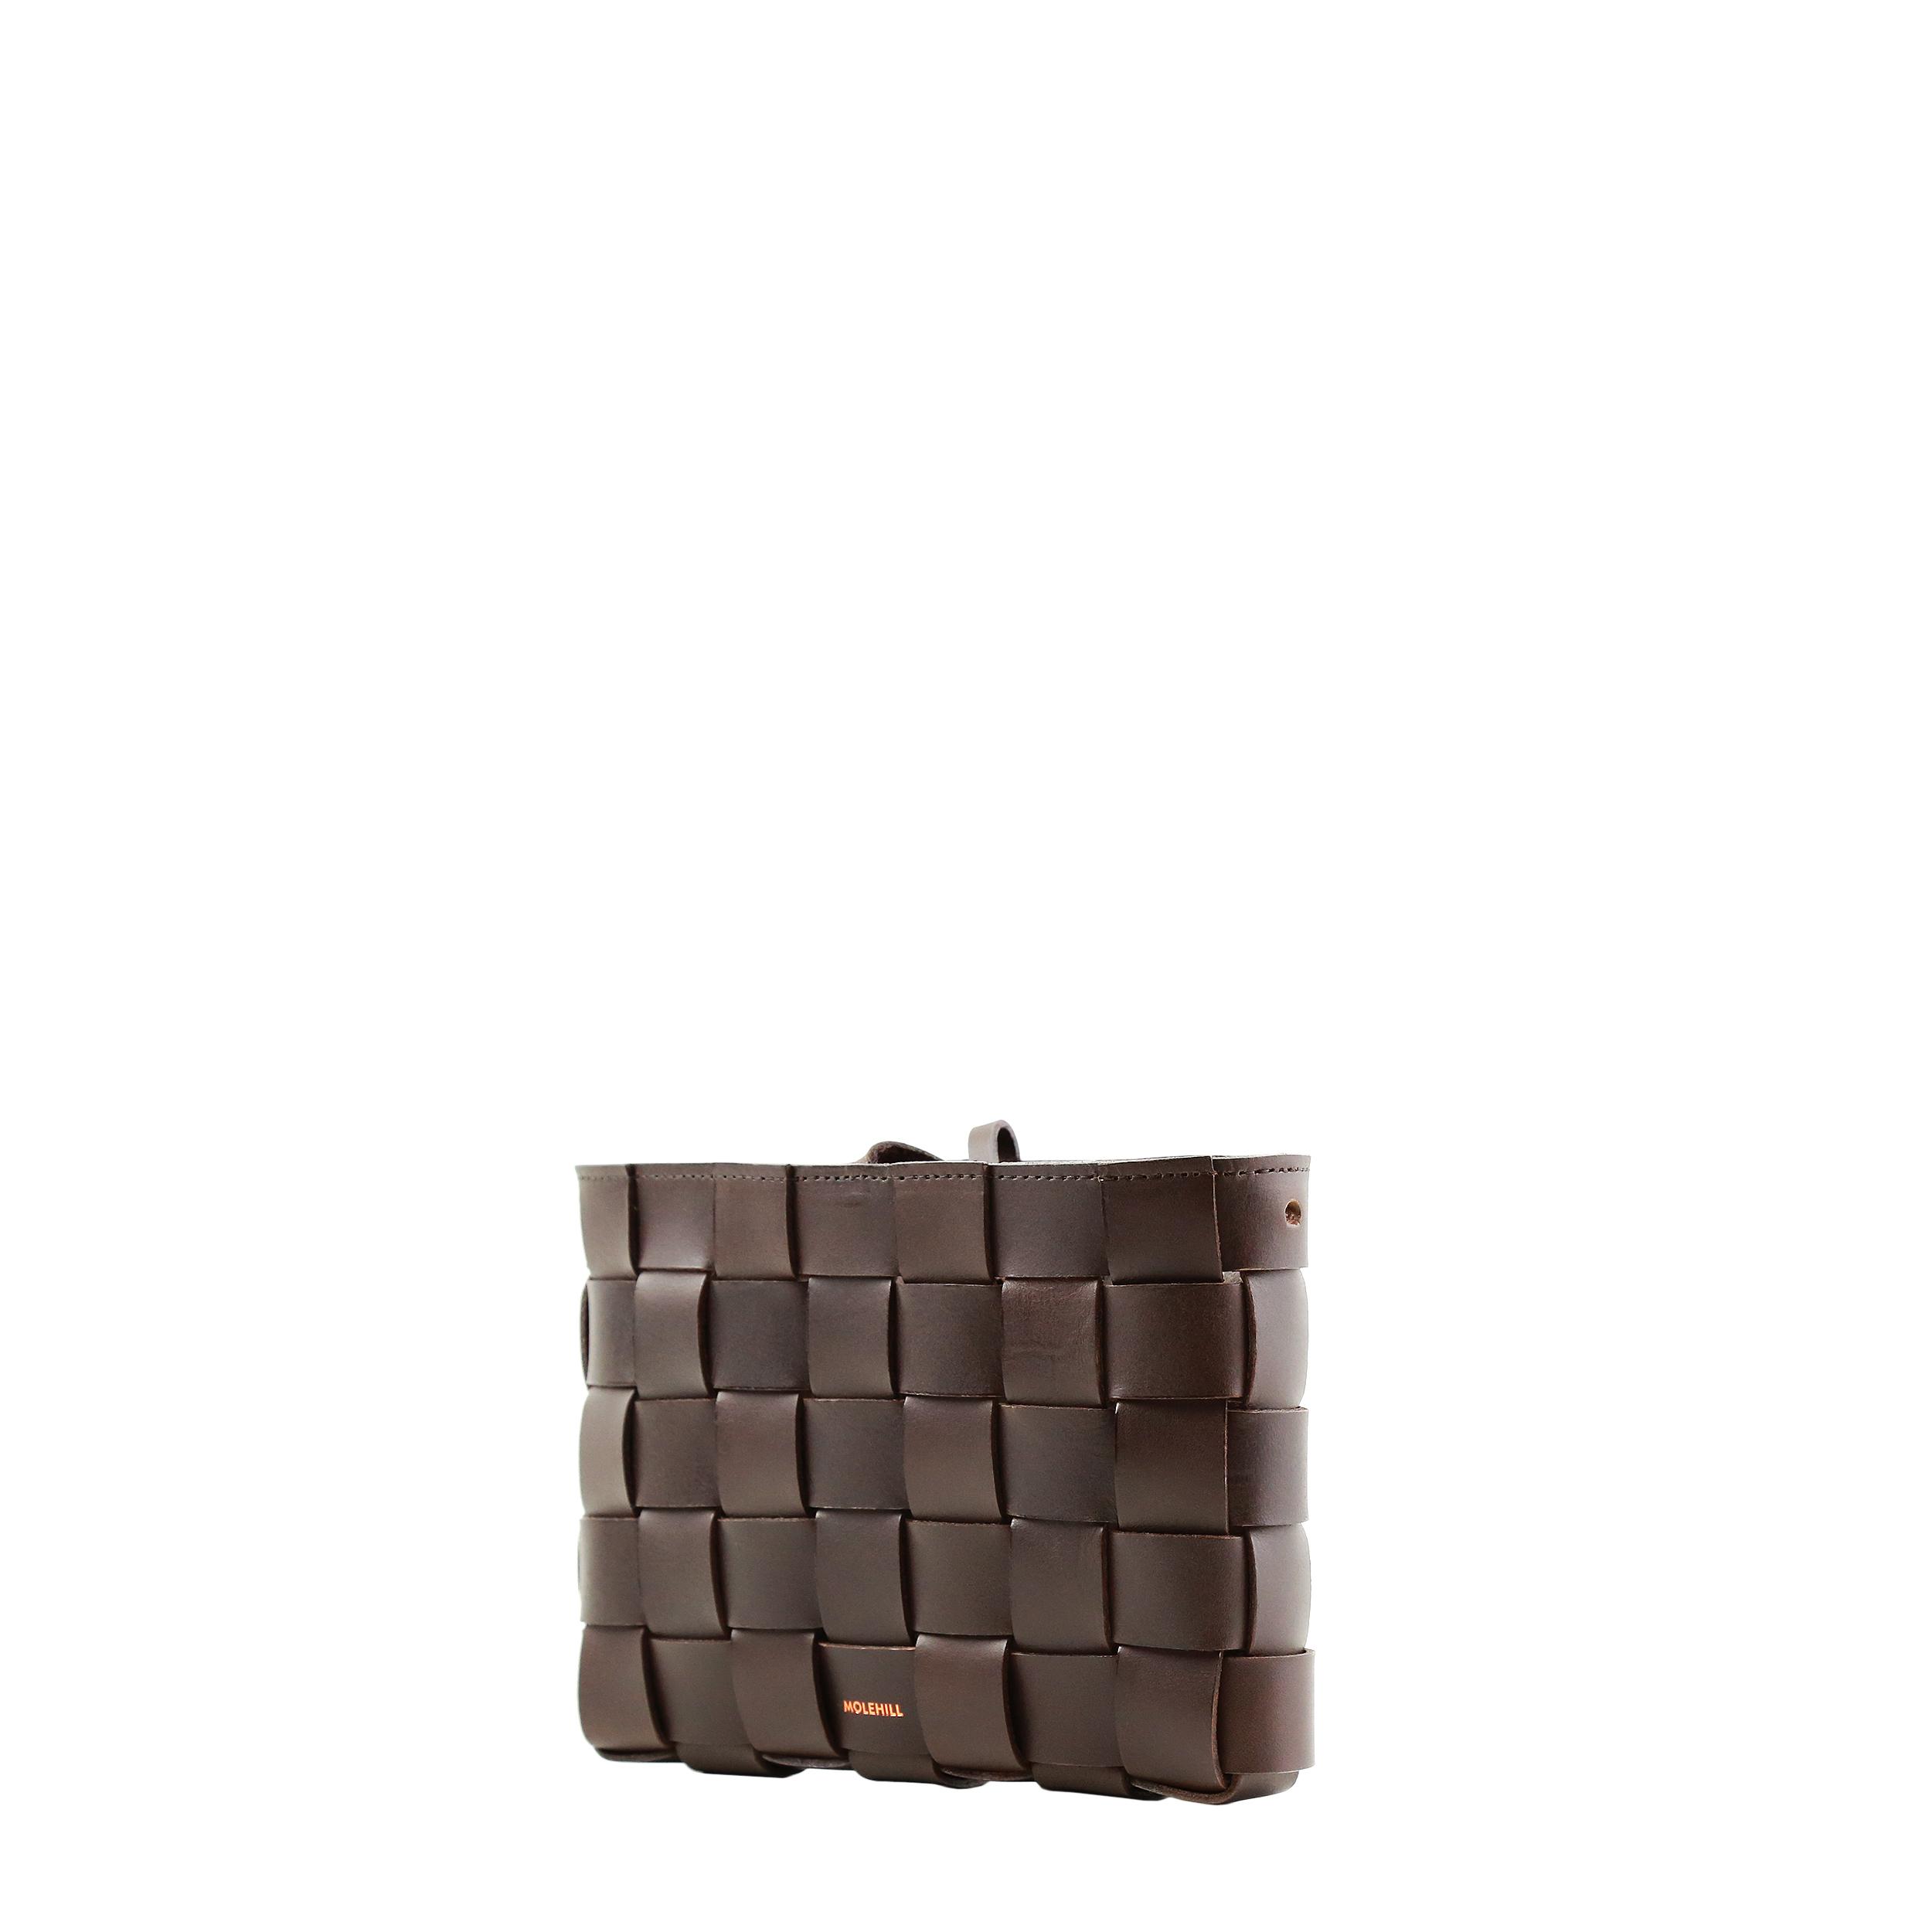 Pane Crossbody Woven Bag Dark Brown-4